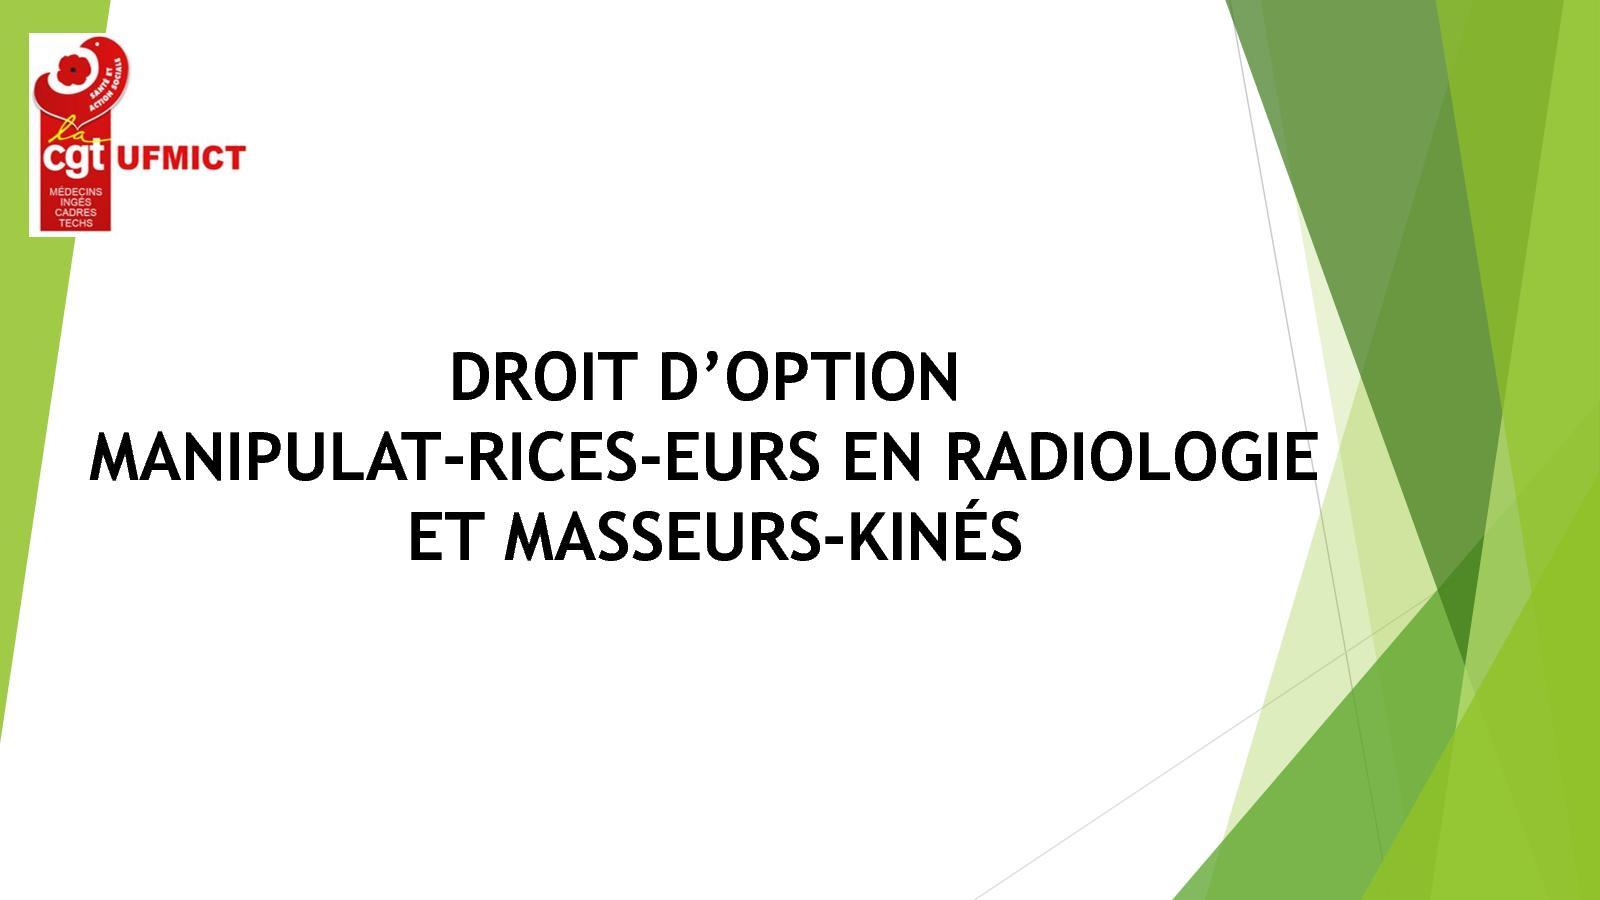 Calameo Cgt 2017 Droit Option Manip Radio Masseur Kine